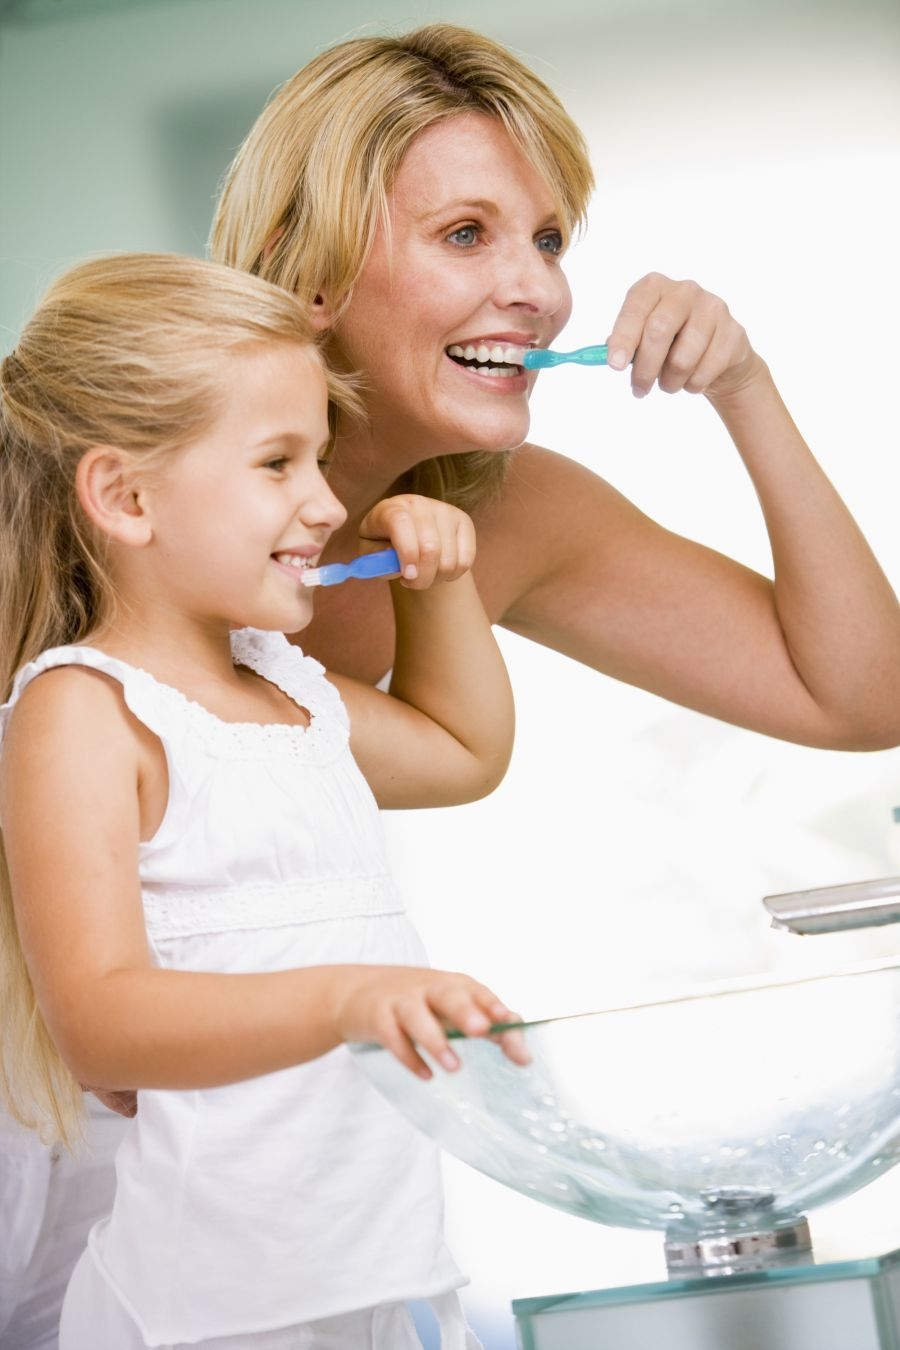 Bathroom sinkbrushing teethchilddaughterdayday in the